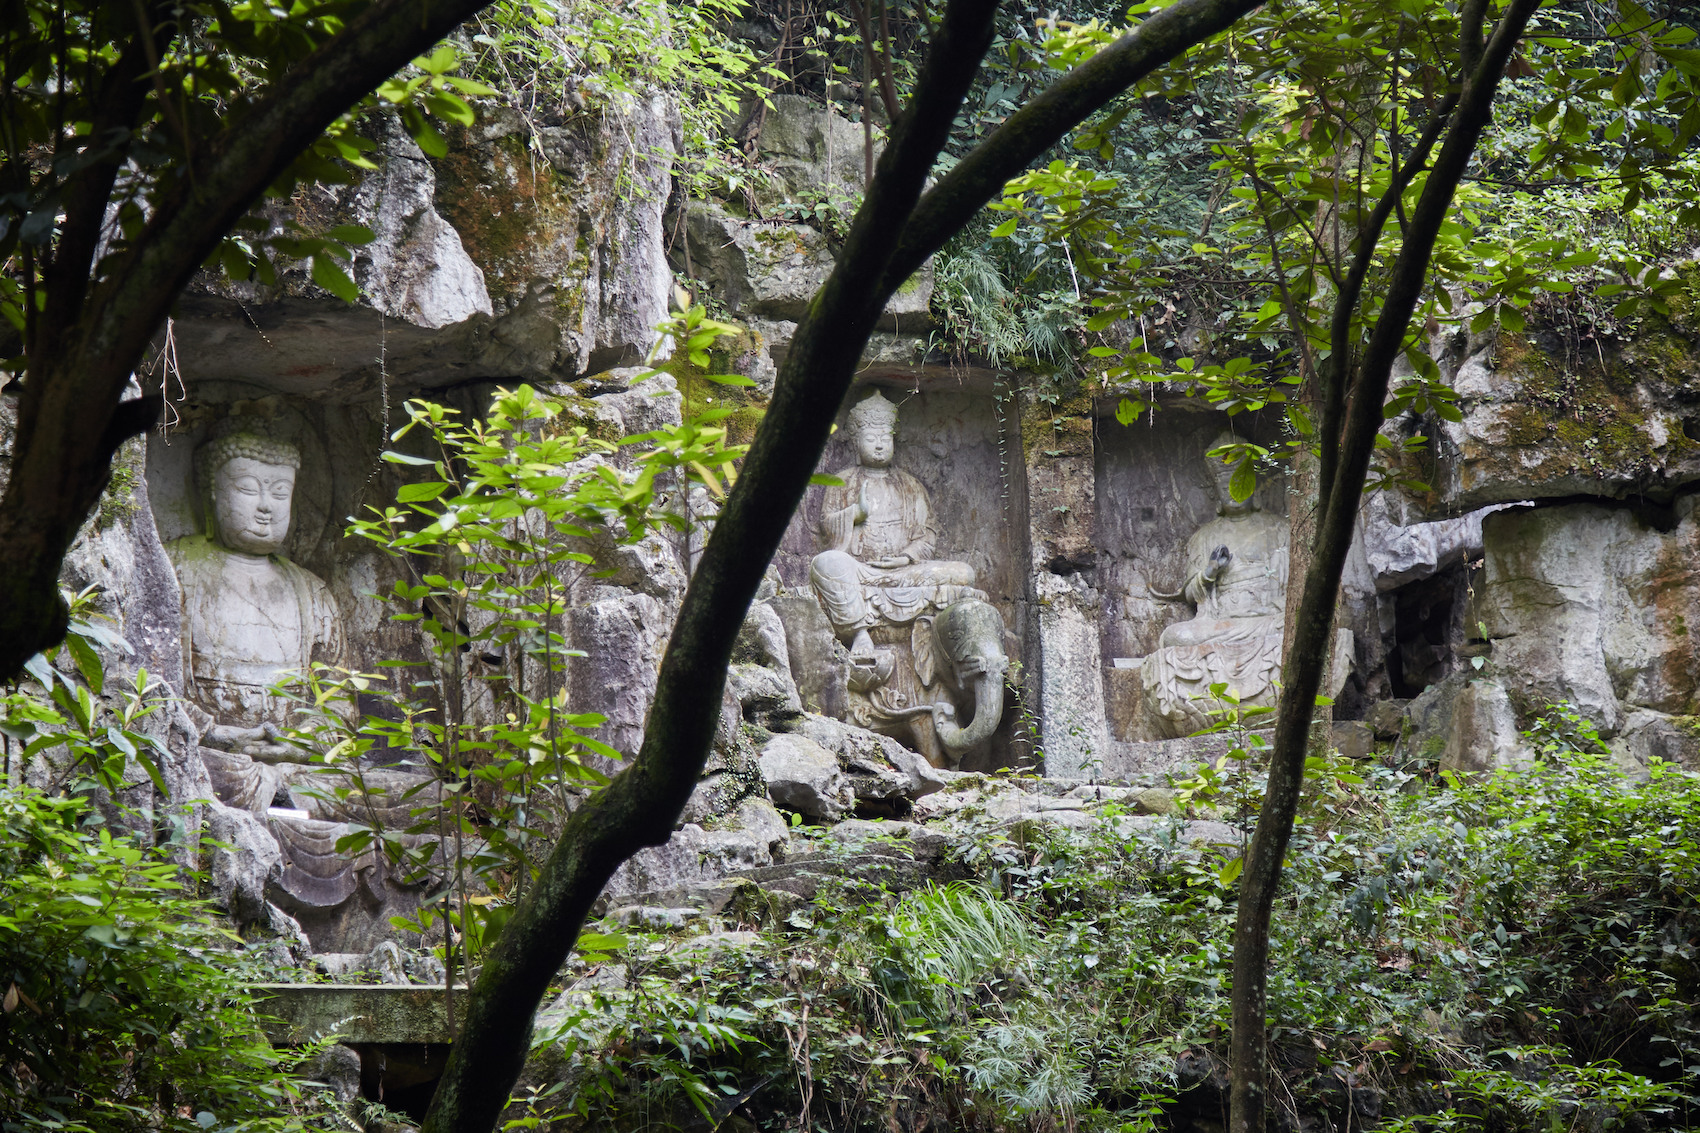 Fei Lai Peak Buddhas